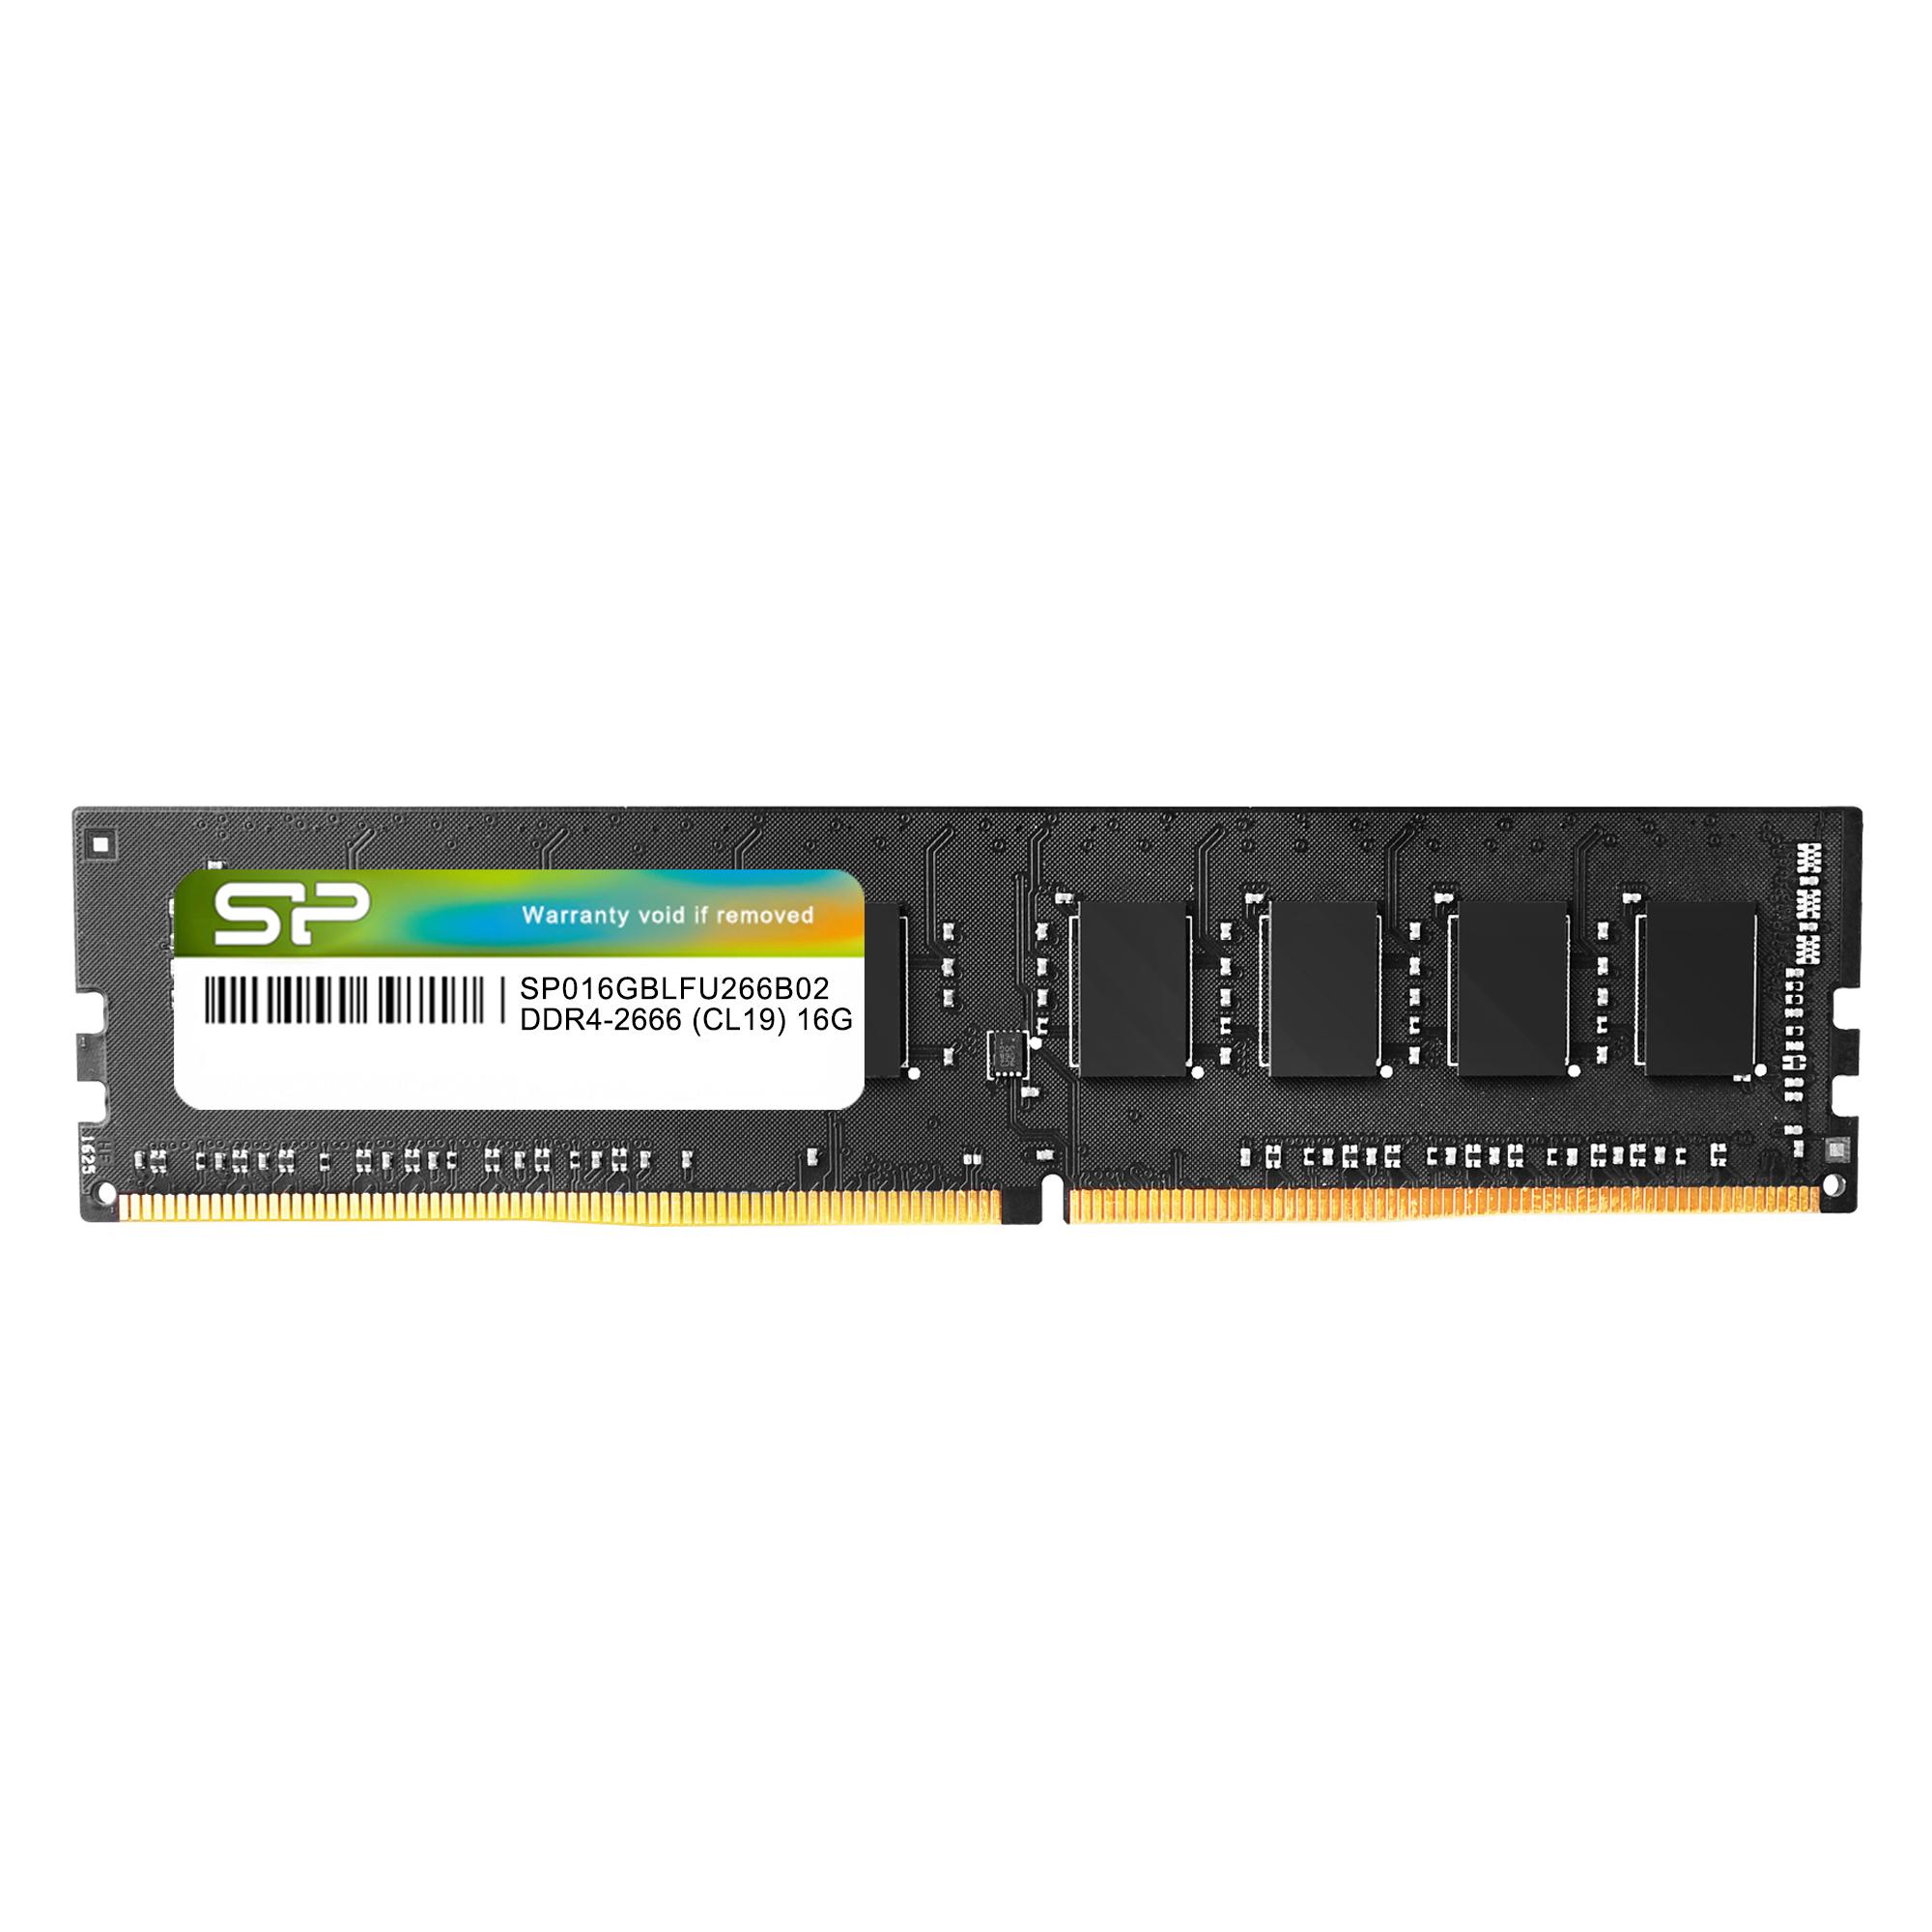 Silicon Power 16GB DDR4 2666MHz UDIMM Desktop Memory